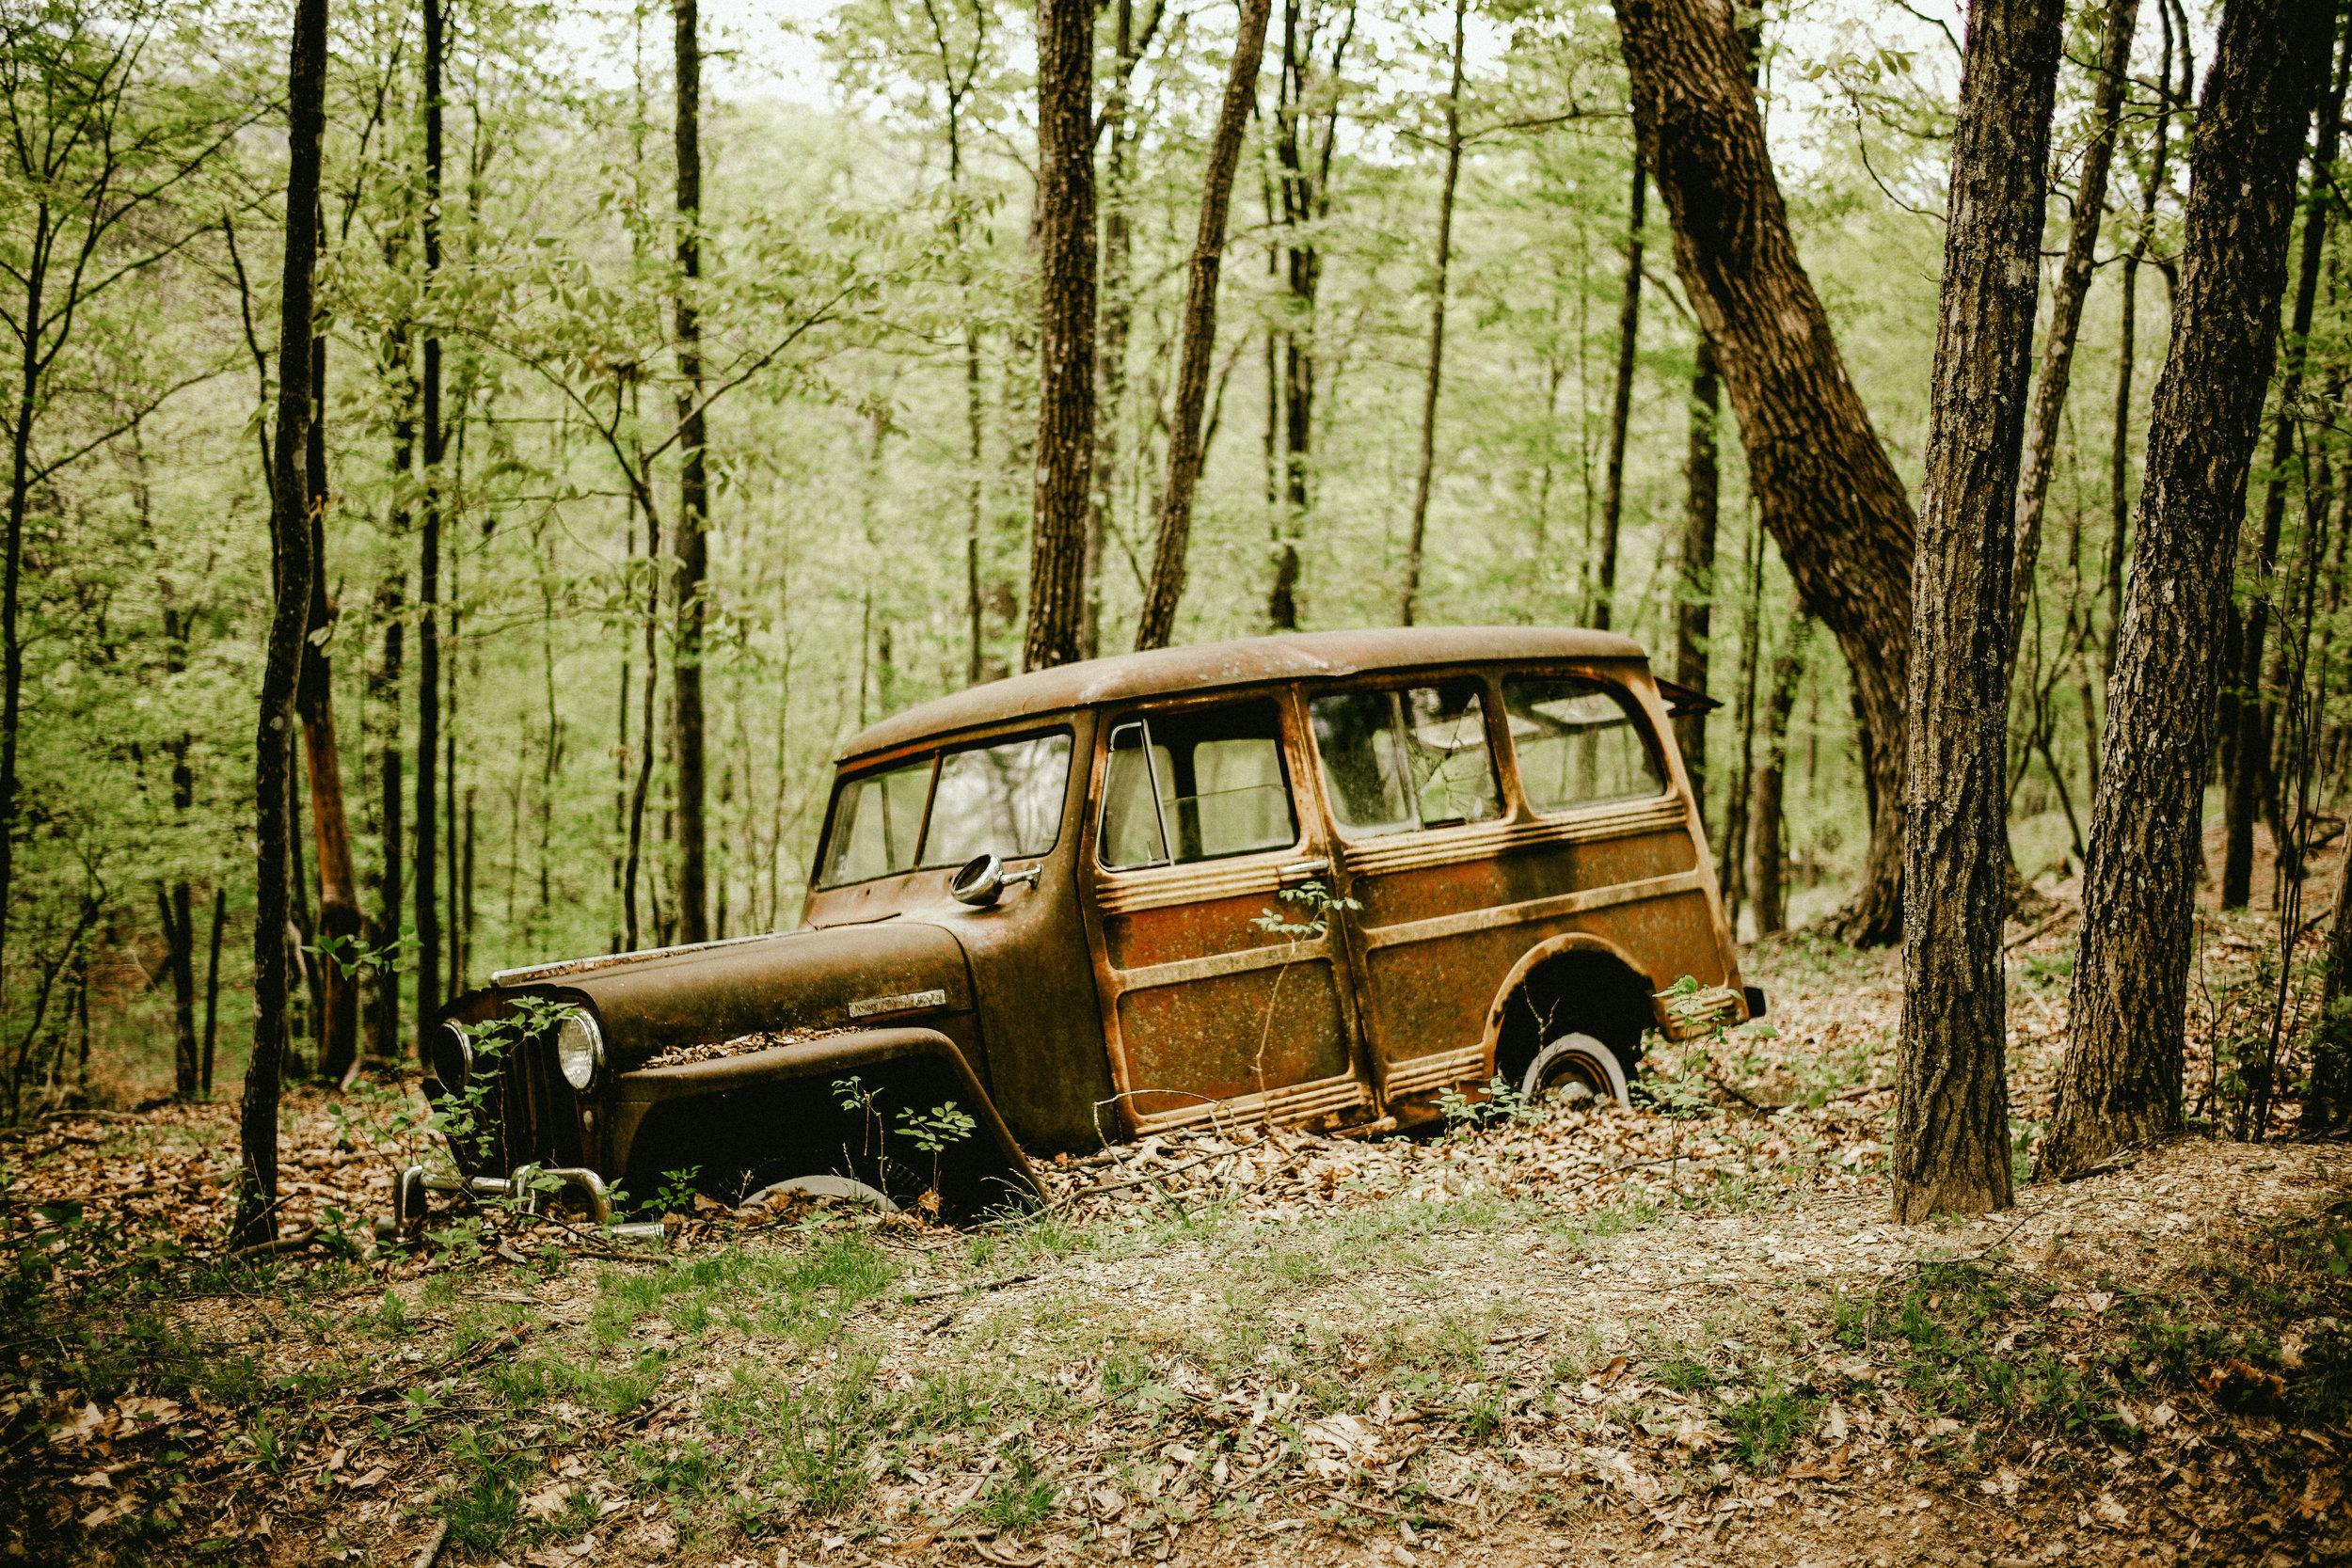 kw-forest-findings-img3.jpg